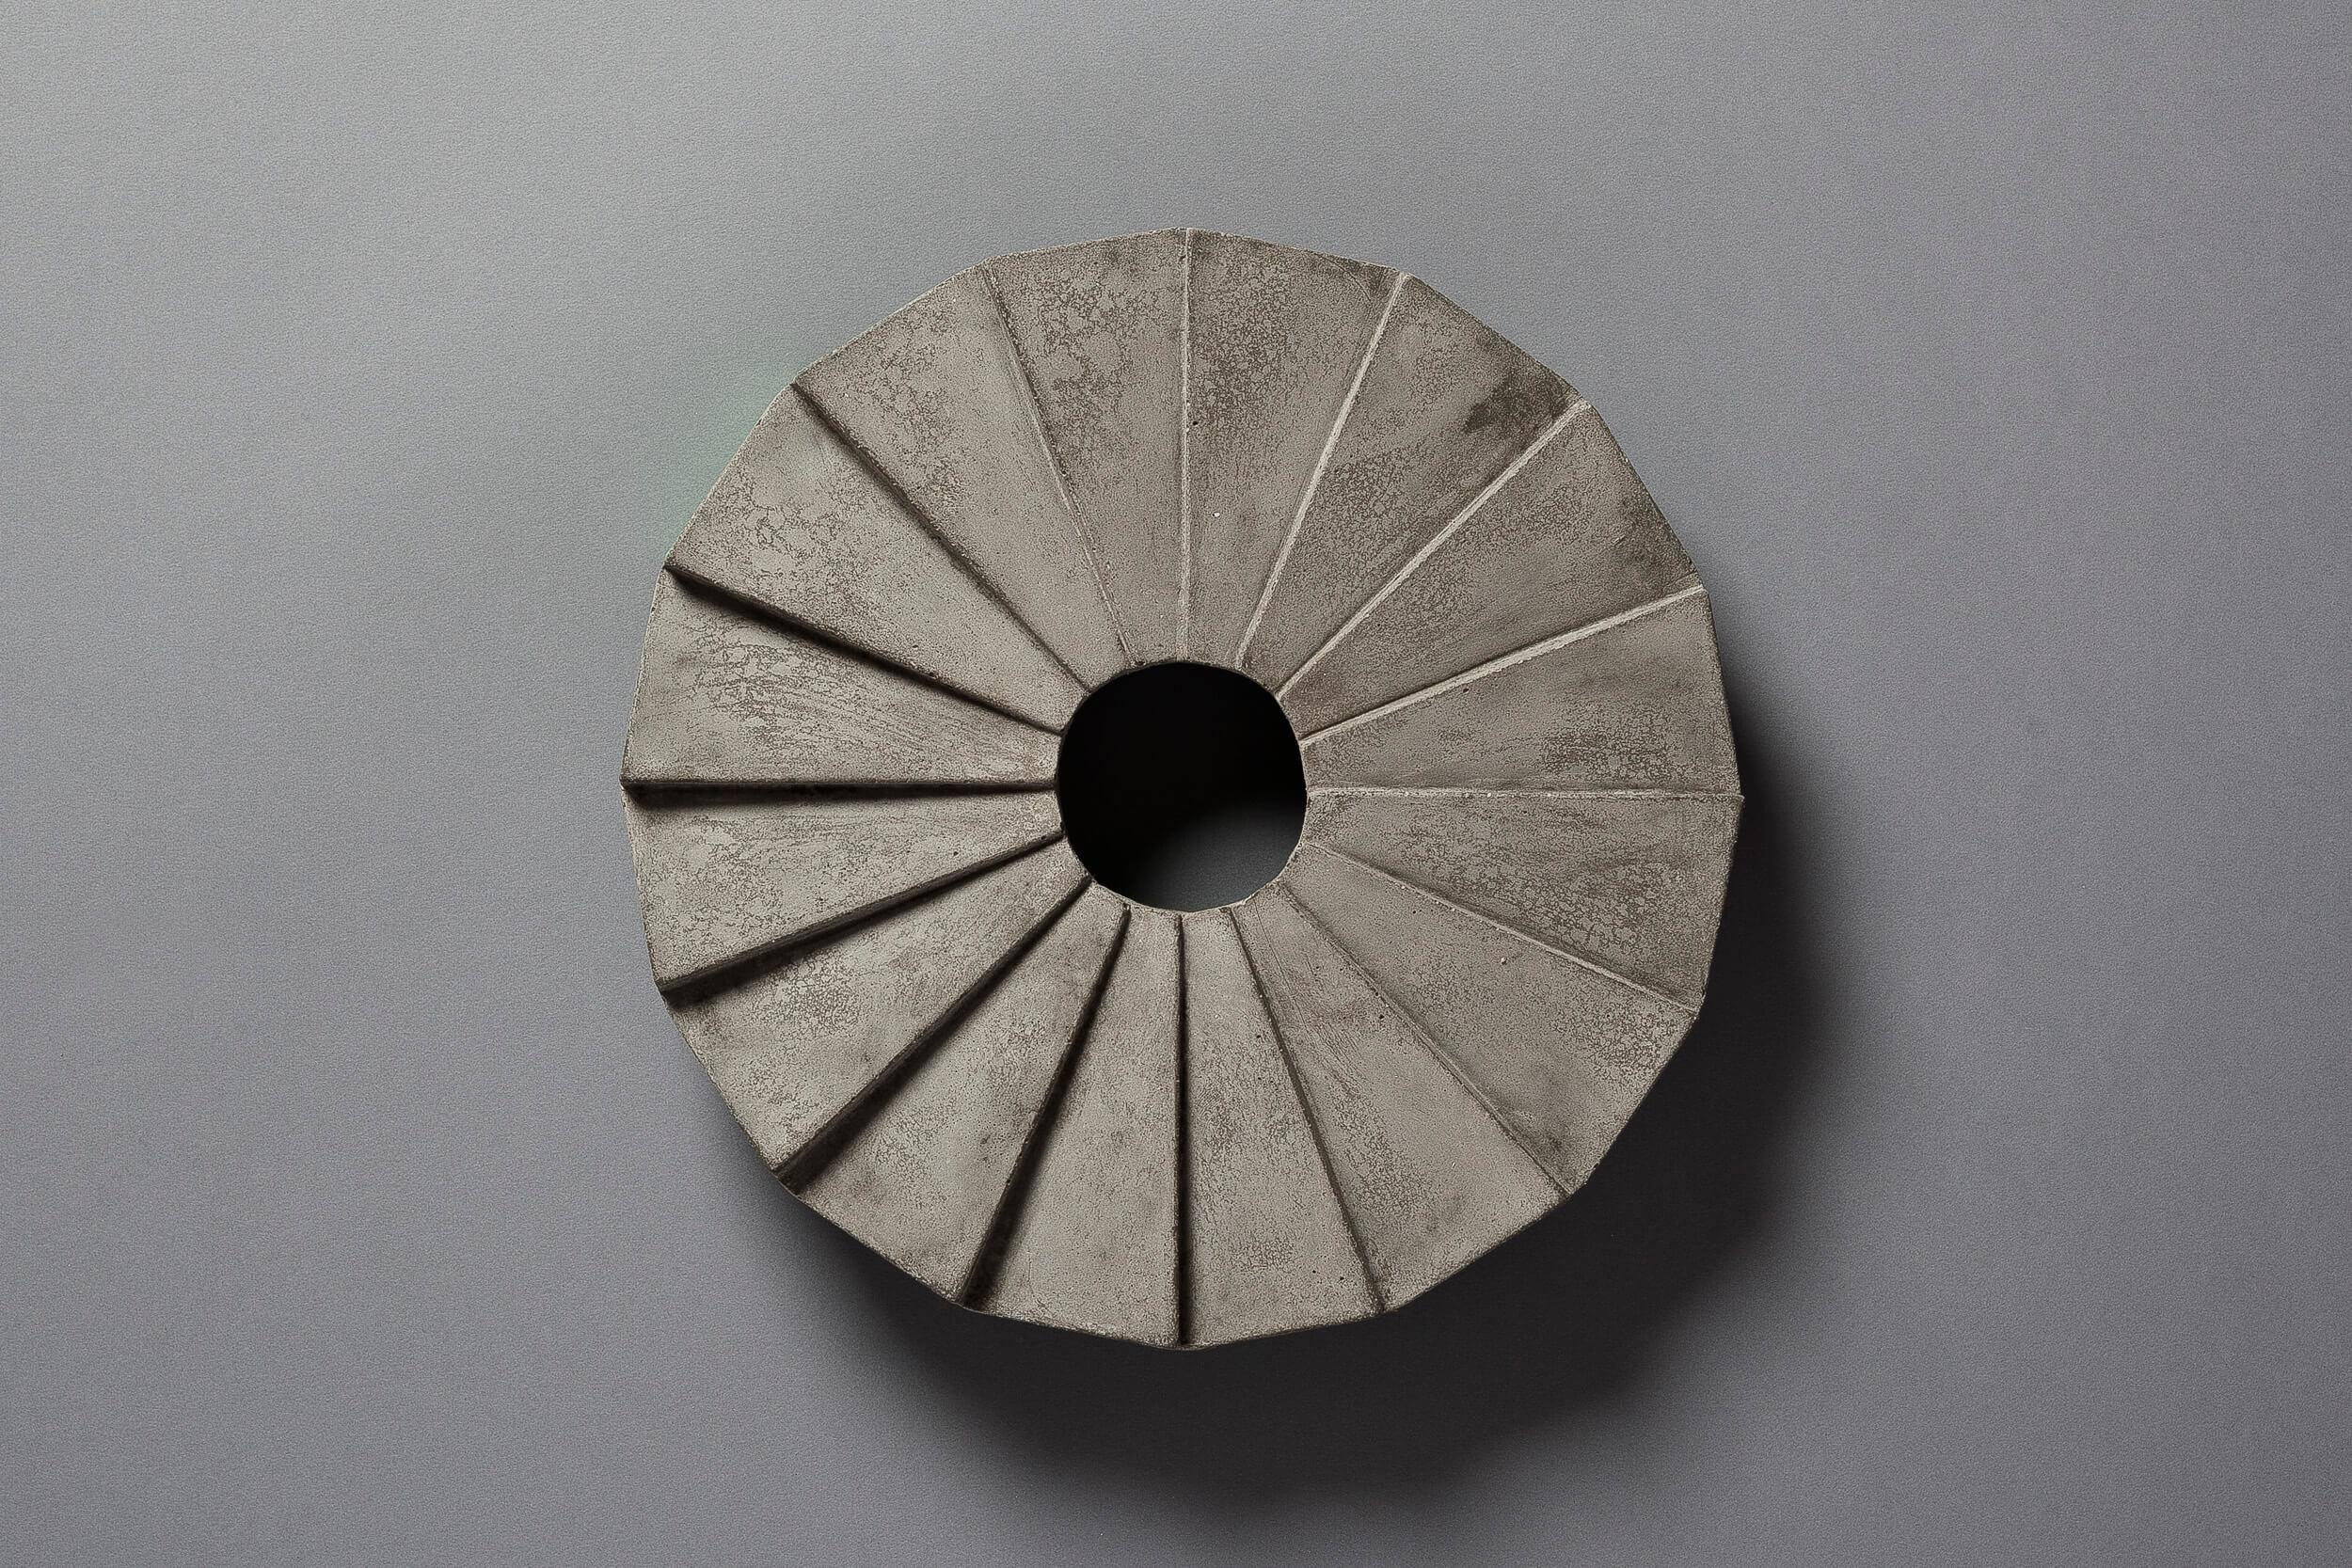 Plaster_studio_tile_24_concrete